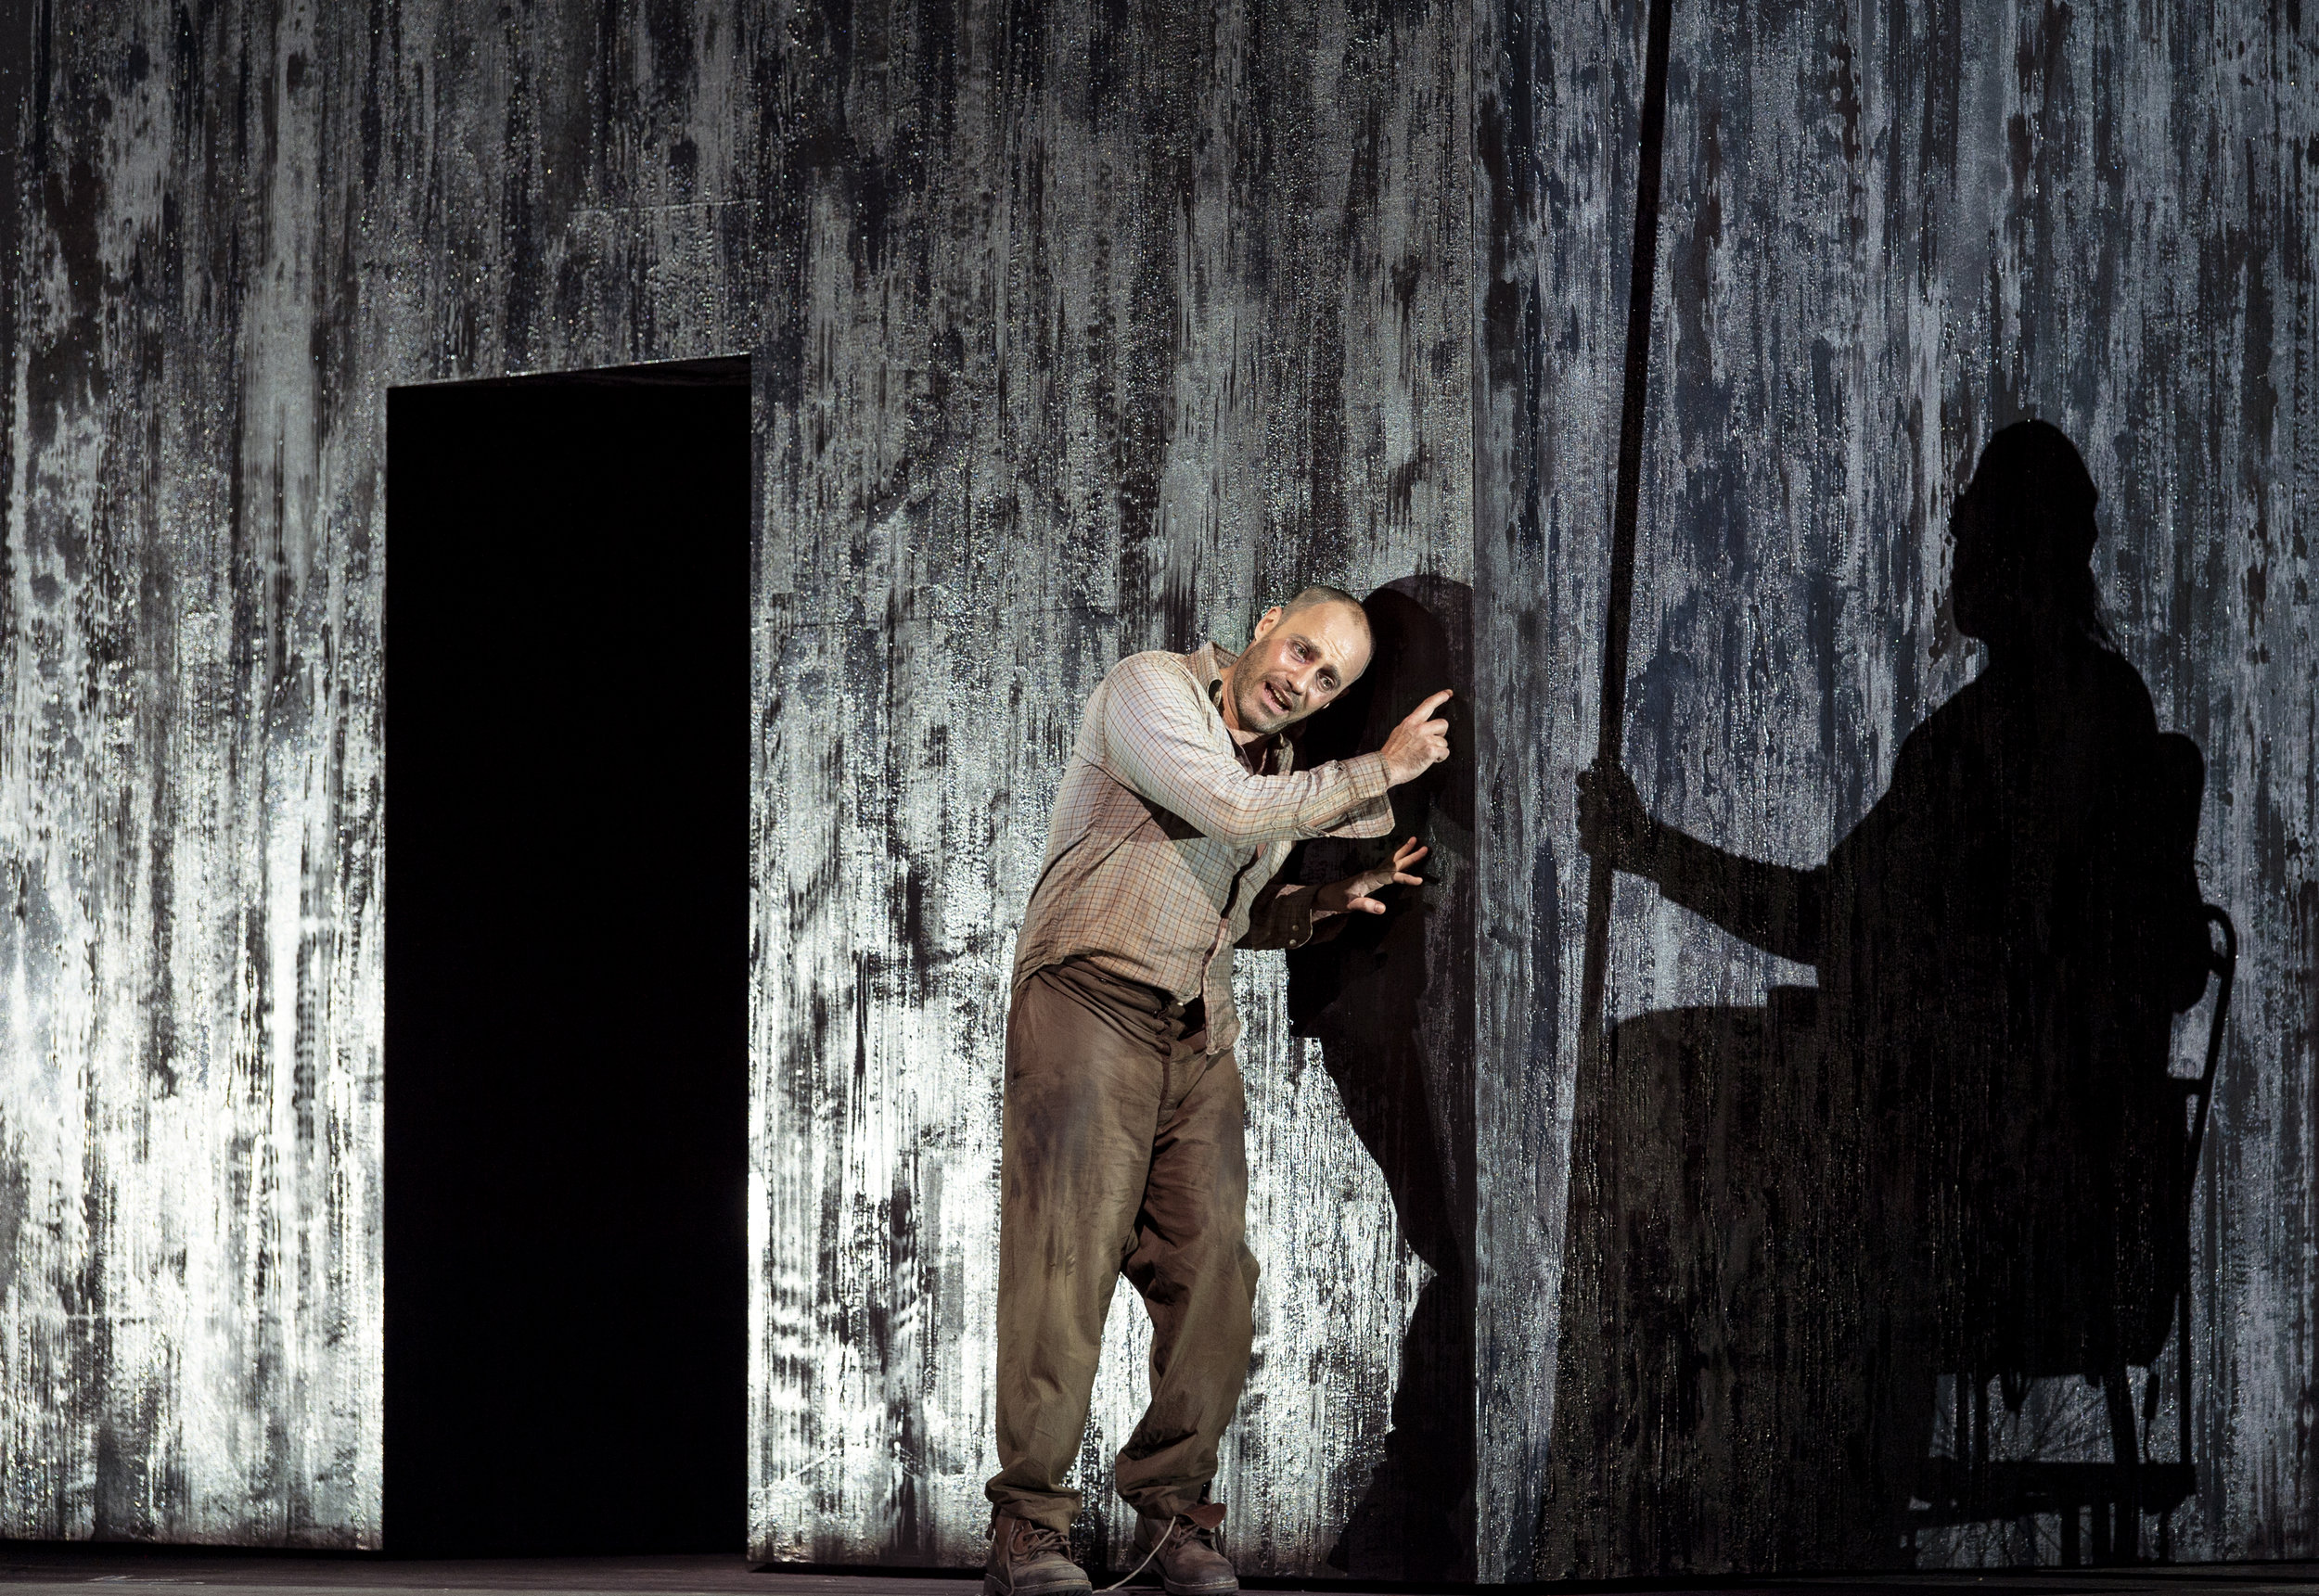 Leigh Melrose in the world premiere production of György Kurtág's  Fin de partie   (Endgame) , 18 November 2018. Photograph: Ruth Walz